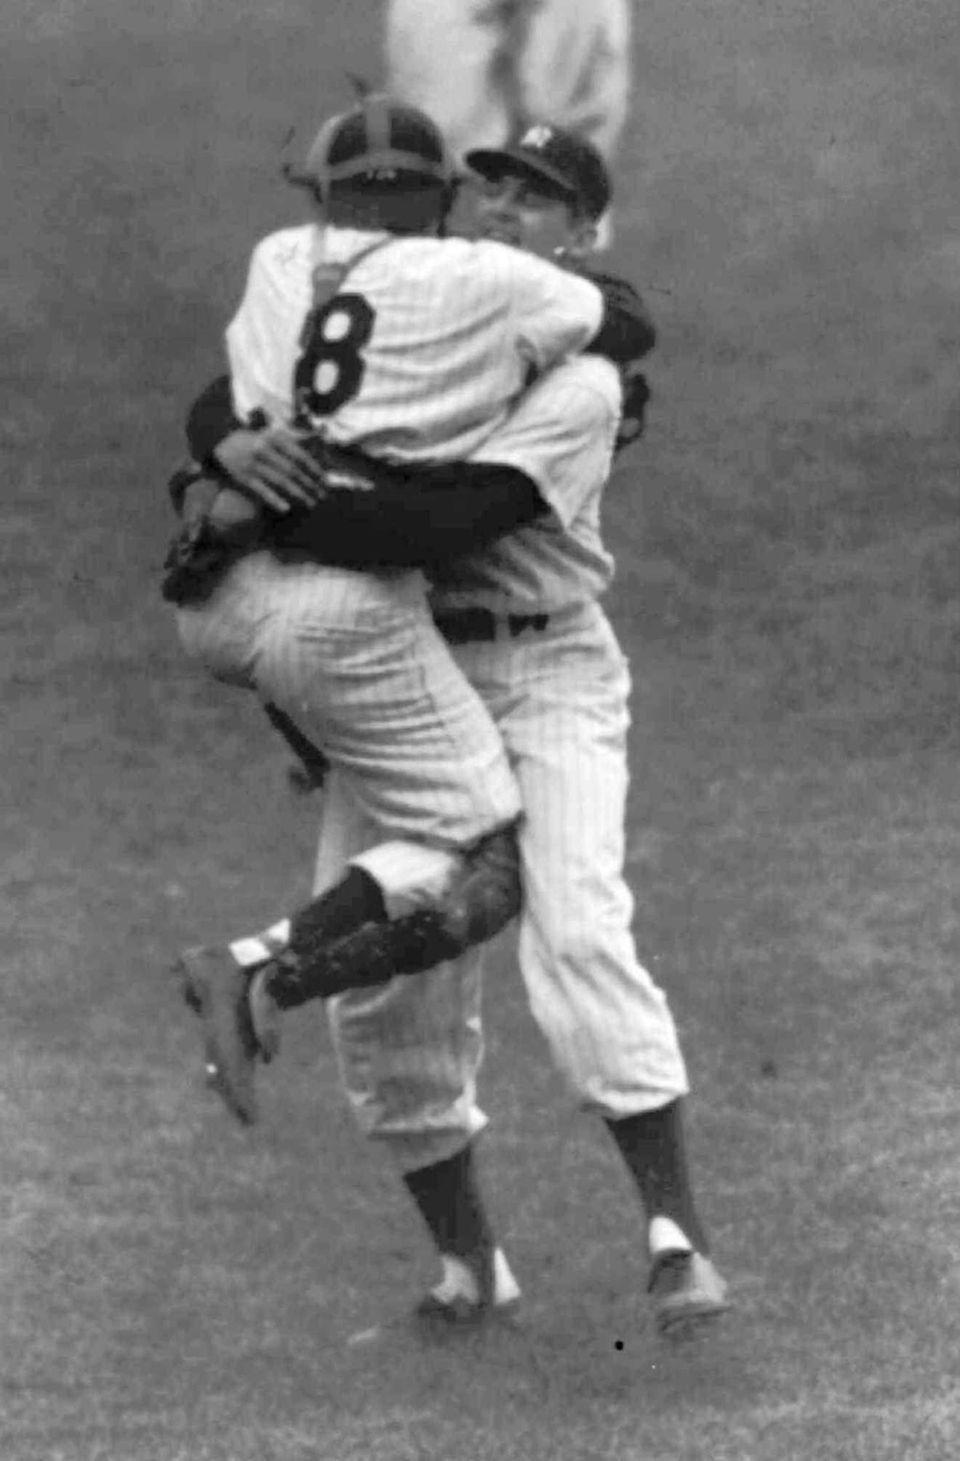 New York Yankees catcher Yogi Berra leaps into